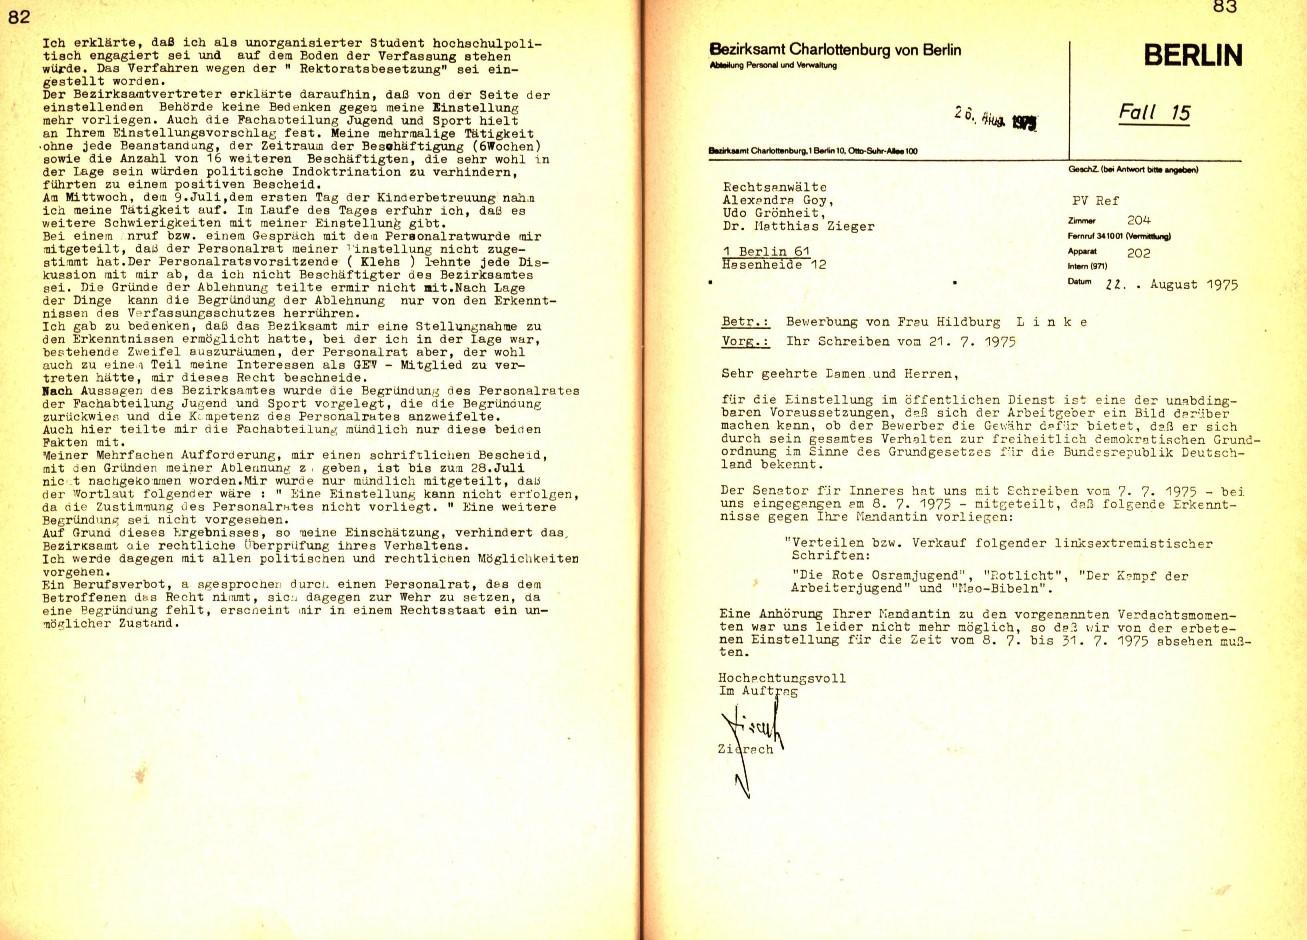 Berlin_VDS_Aktionskomitee_1975_BerufsverboteII_43